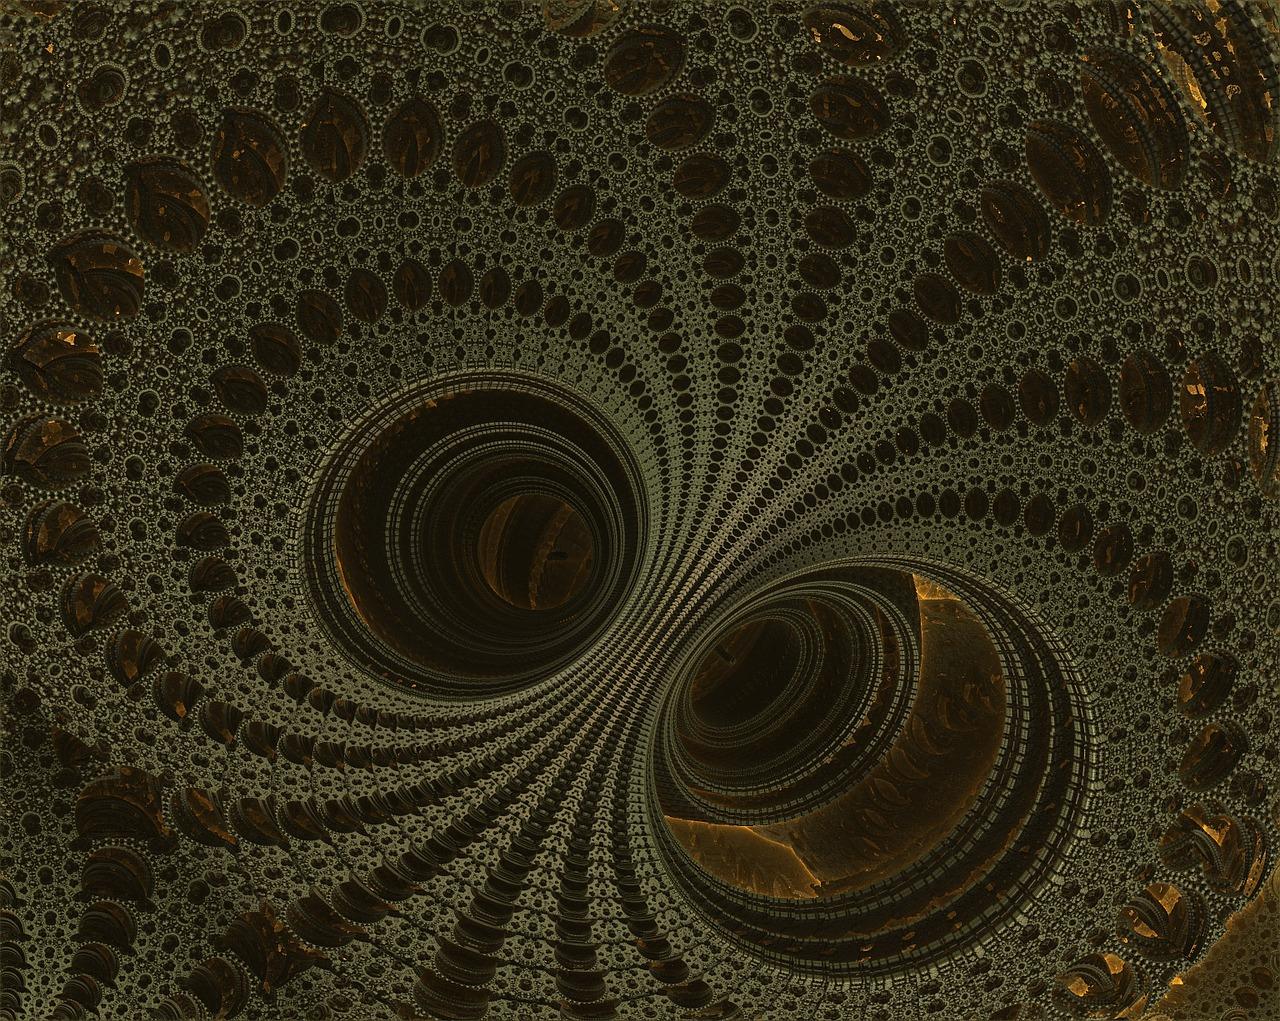 Die Physik unseres Universums